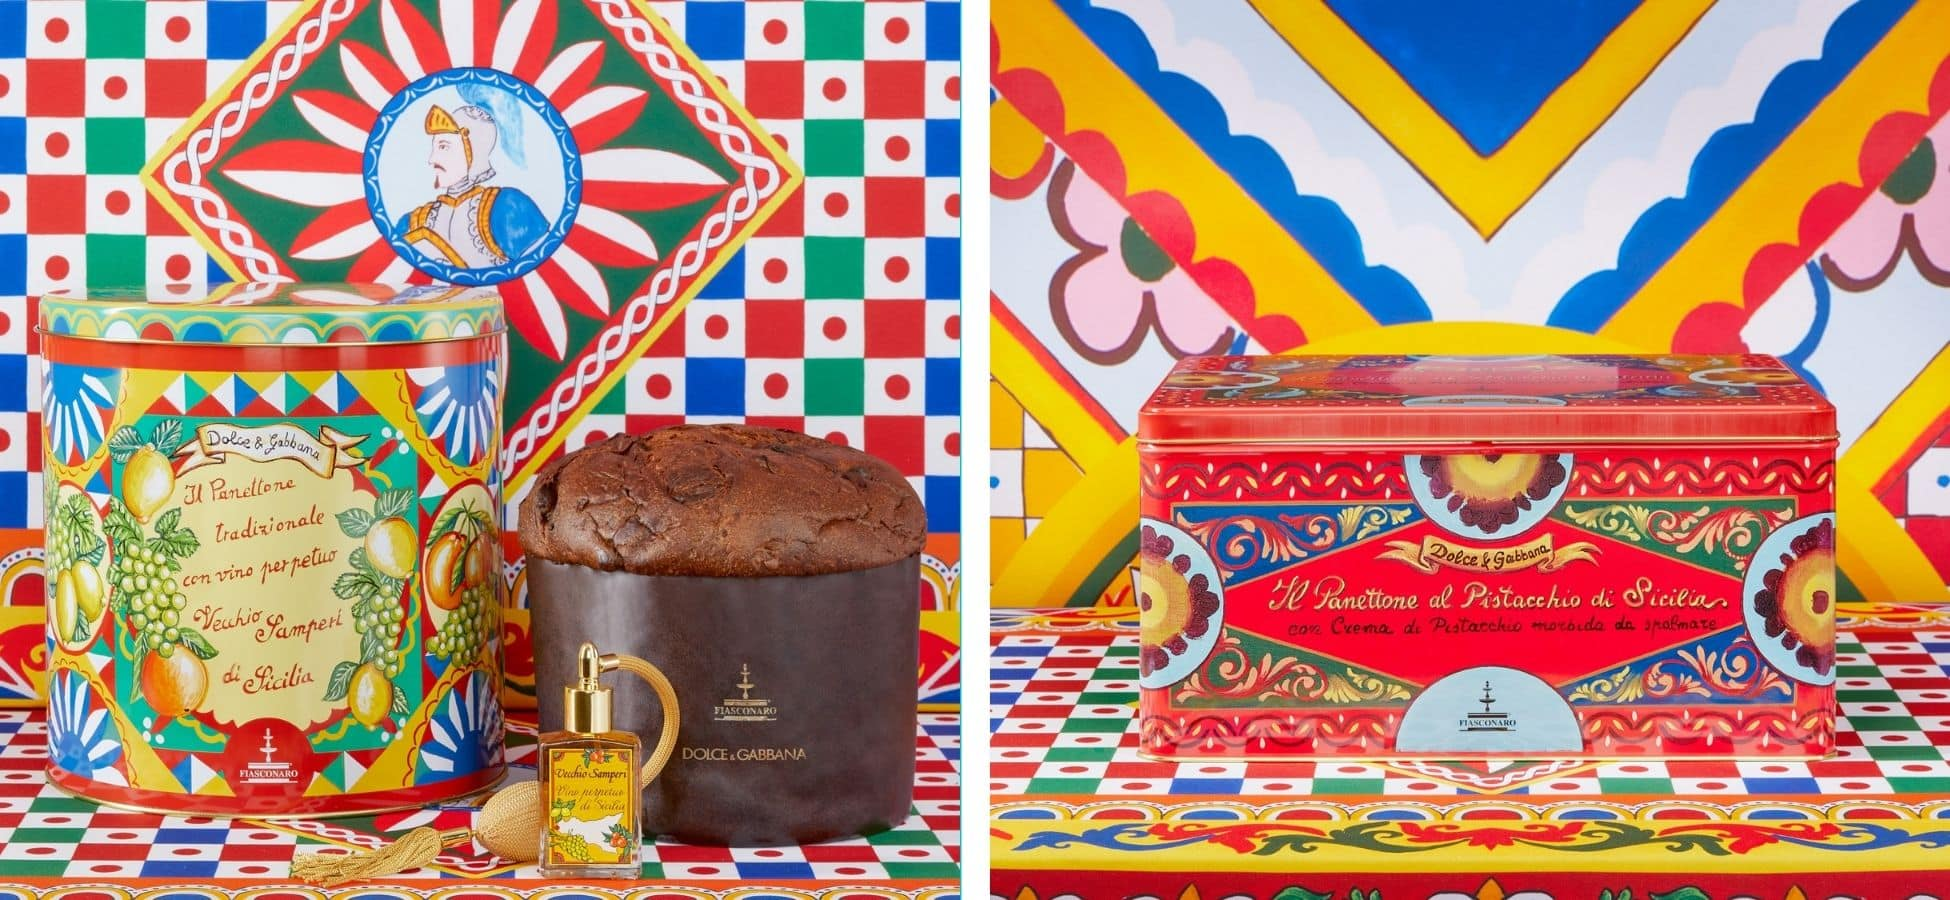 Gamme de panettones Dolce & Gabbana